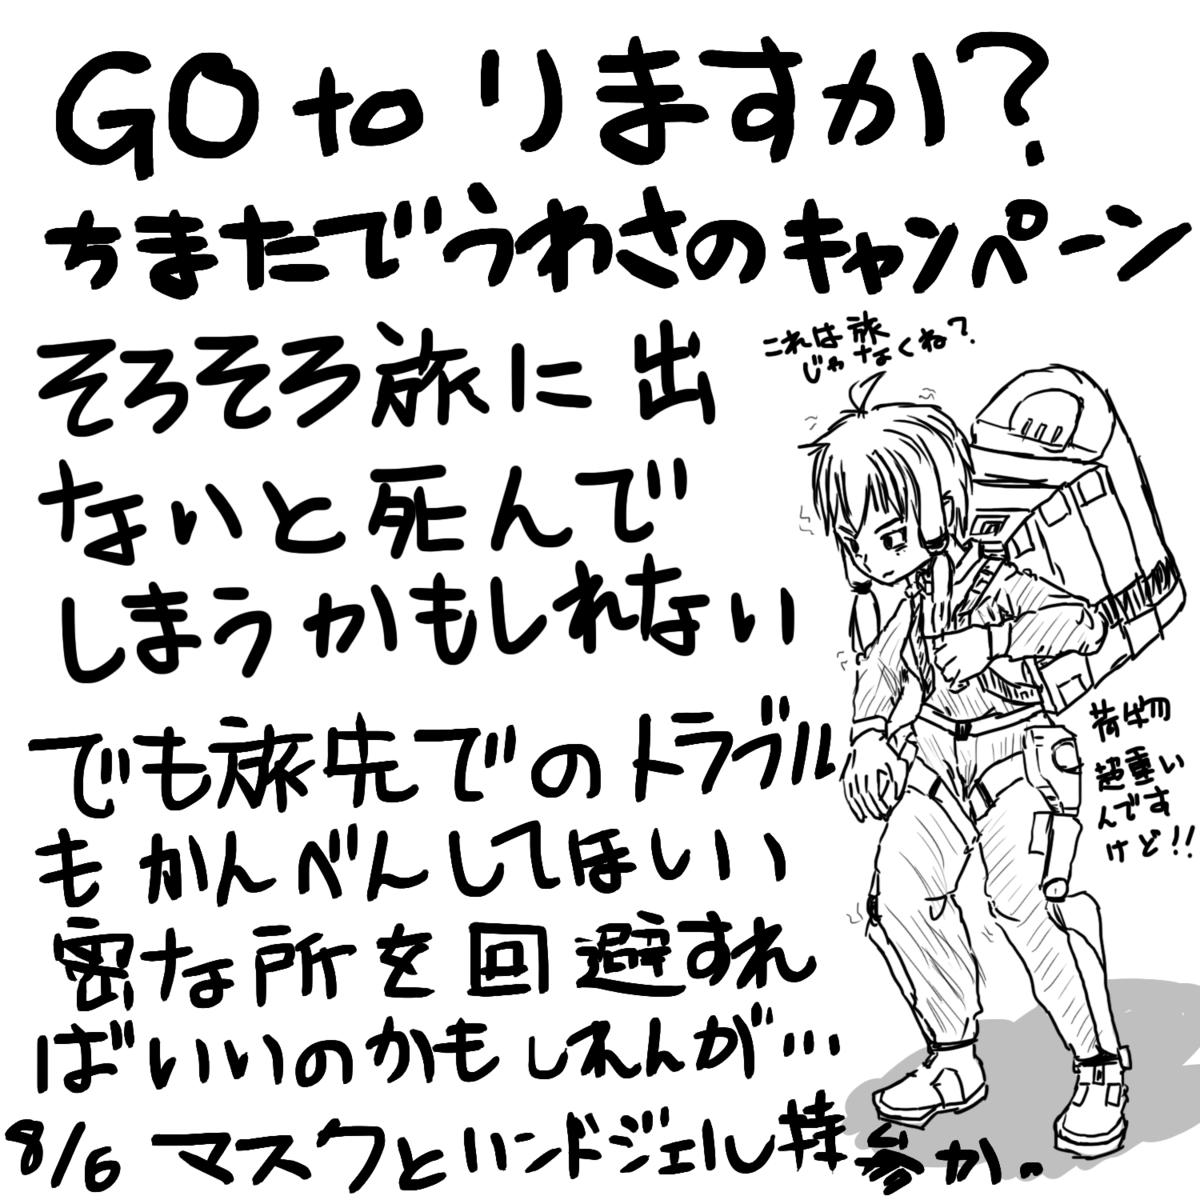 f:id:zomuzomu:20200806110404p:plain